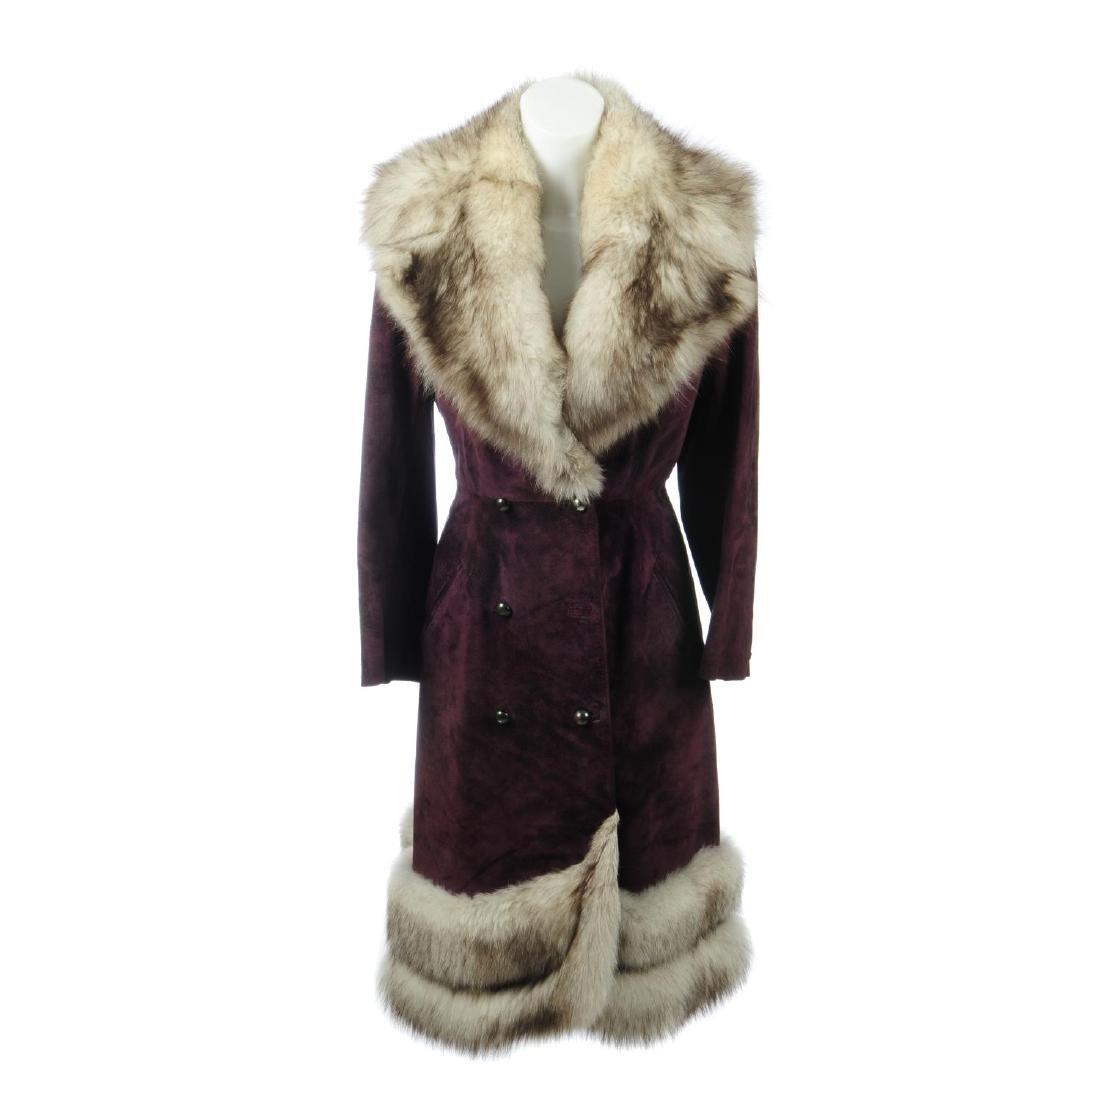 A purple suede full-length coat with fox fur trim.